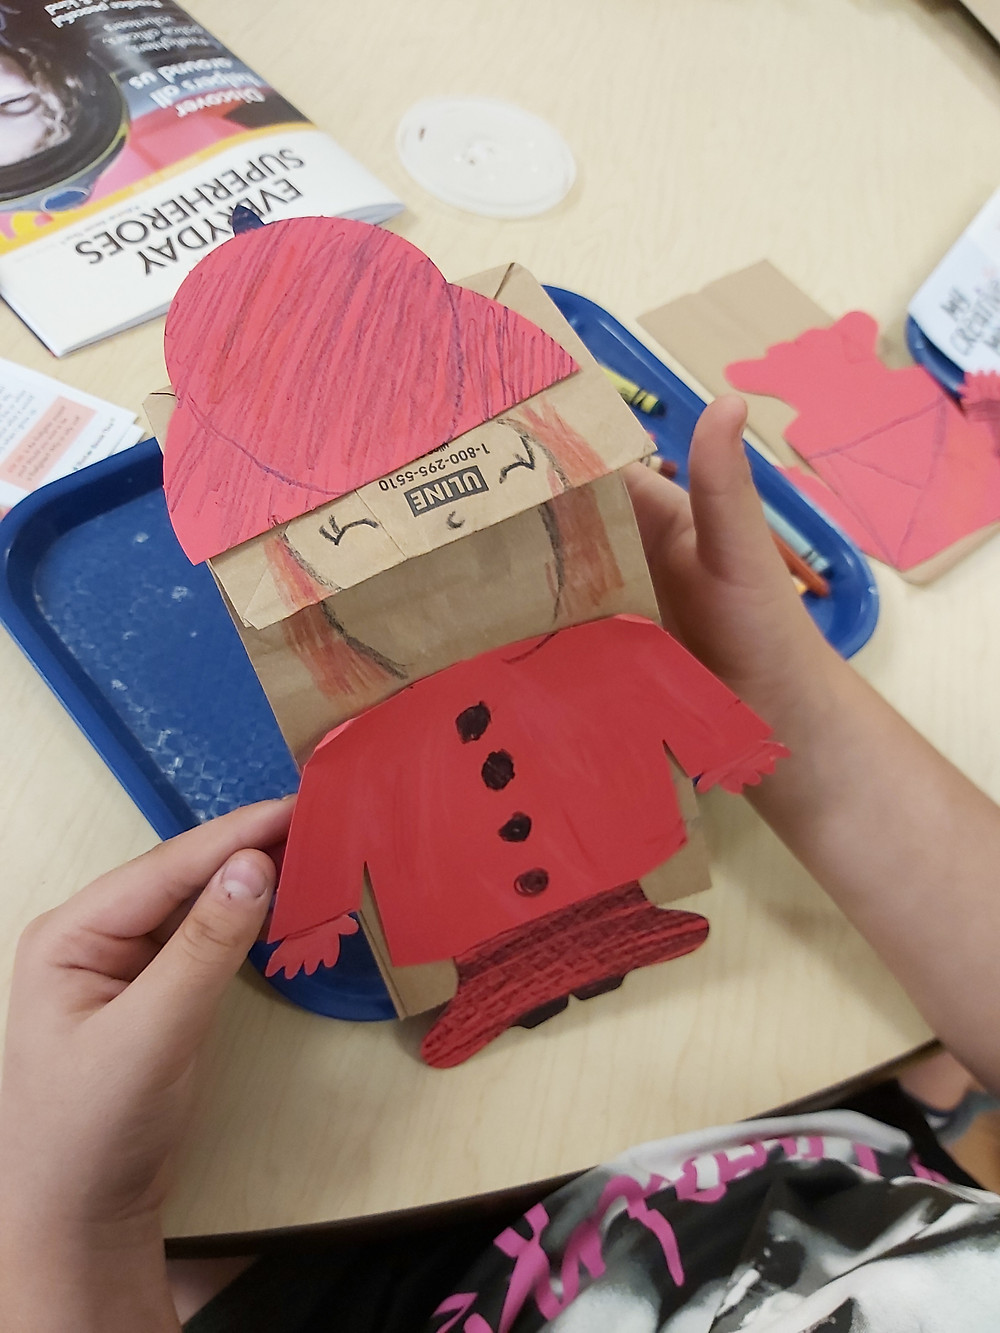 preschooler's firefighter puppet finished